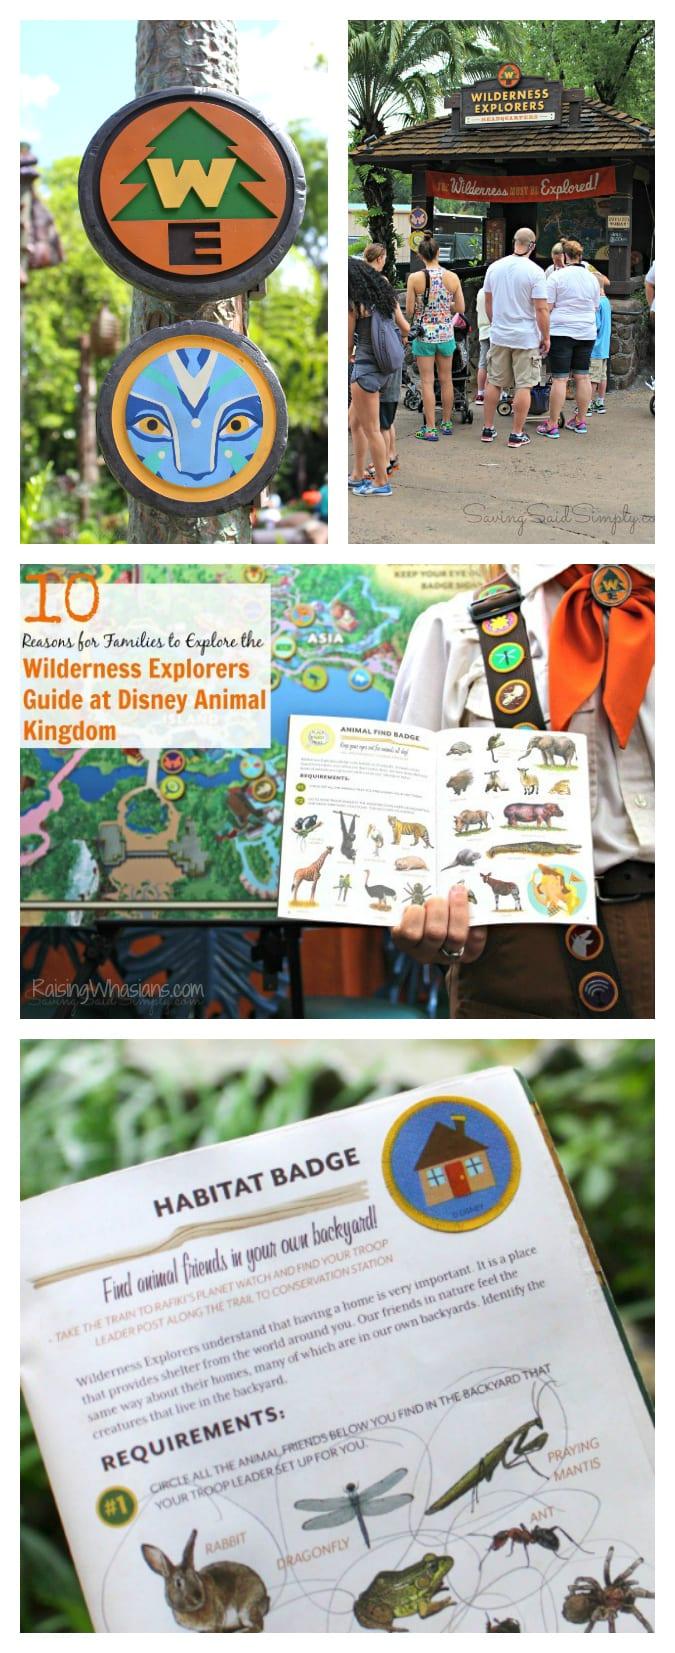 Wilderness explorers guide tips pinterest